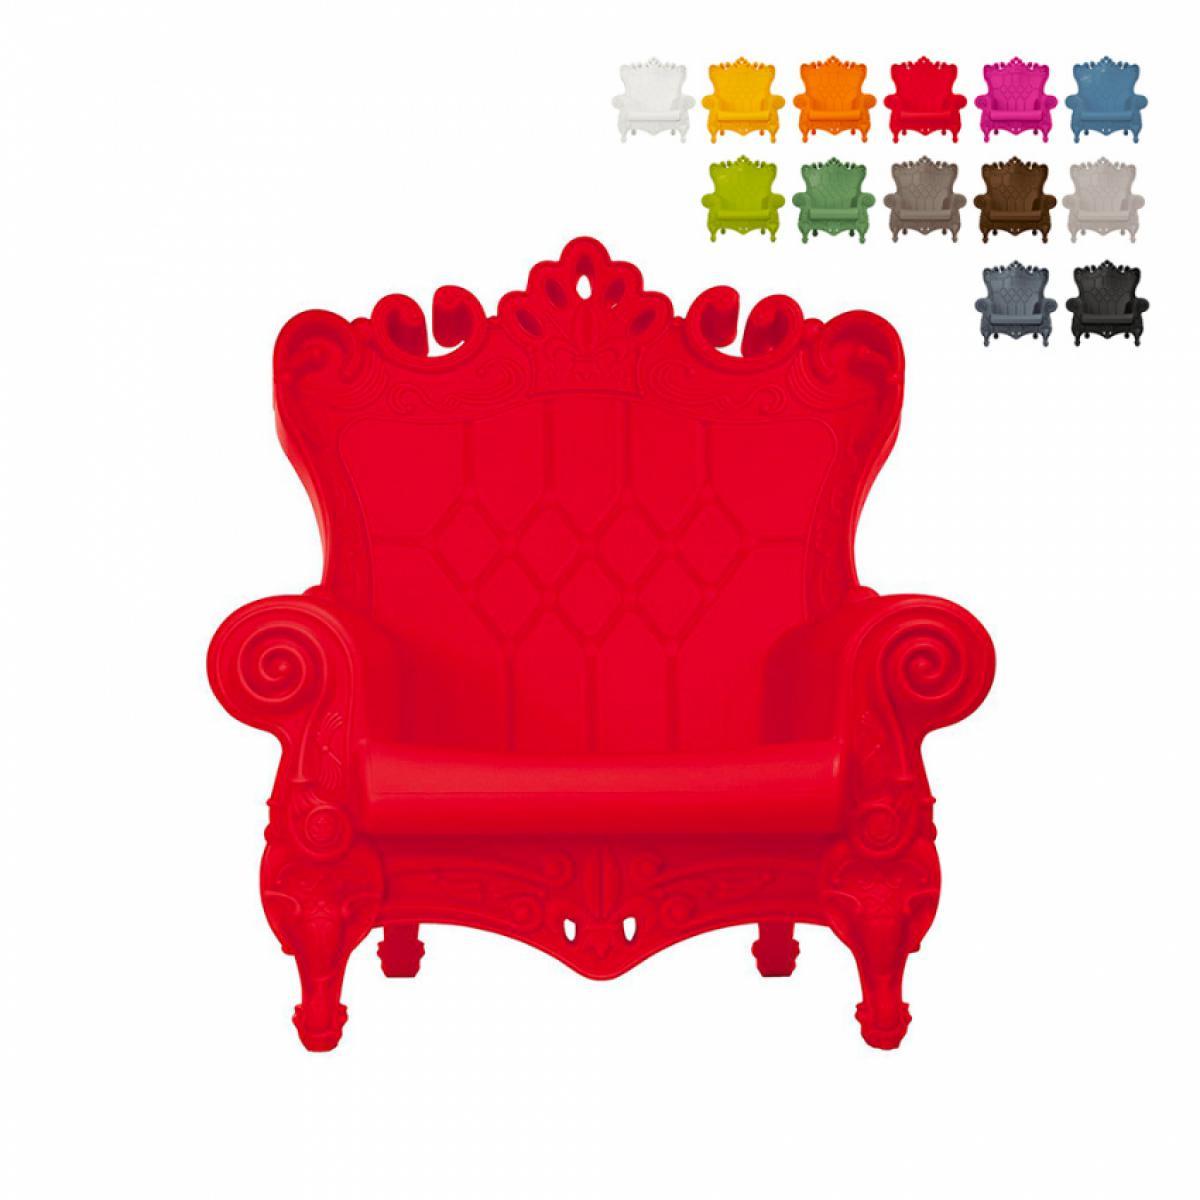 Slide Fauteuil Trône Design Moderne Slide Queen Of Love, Couleur: Rouge